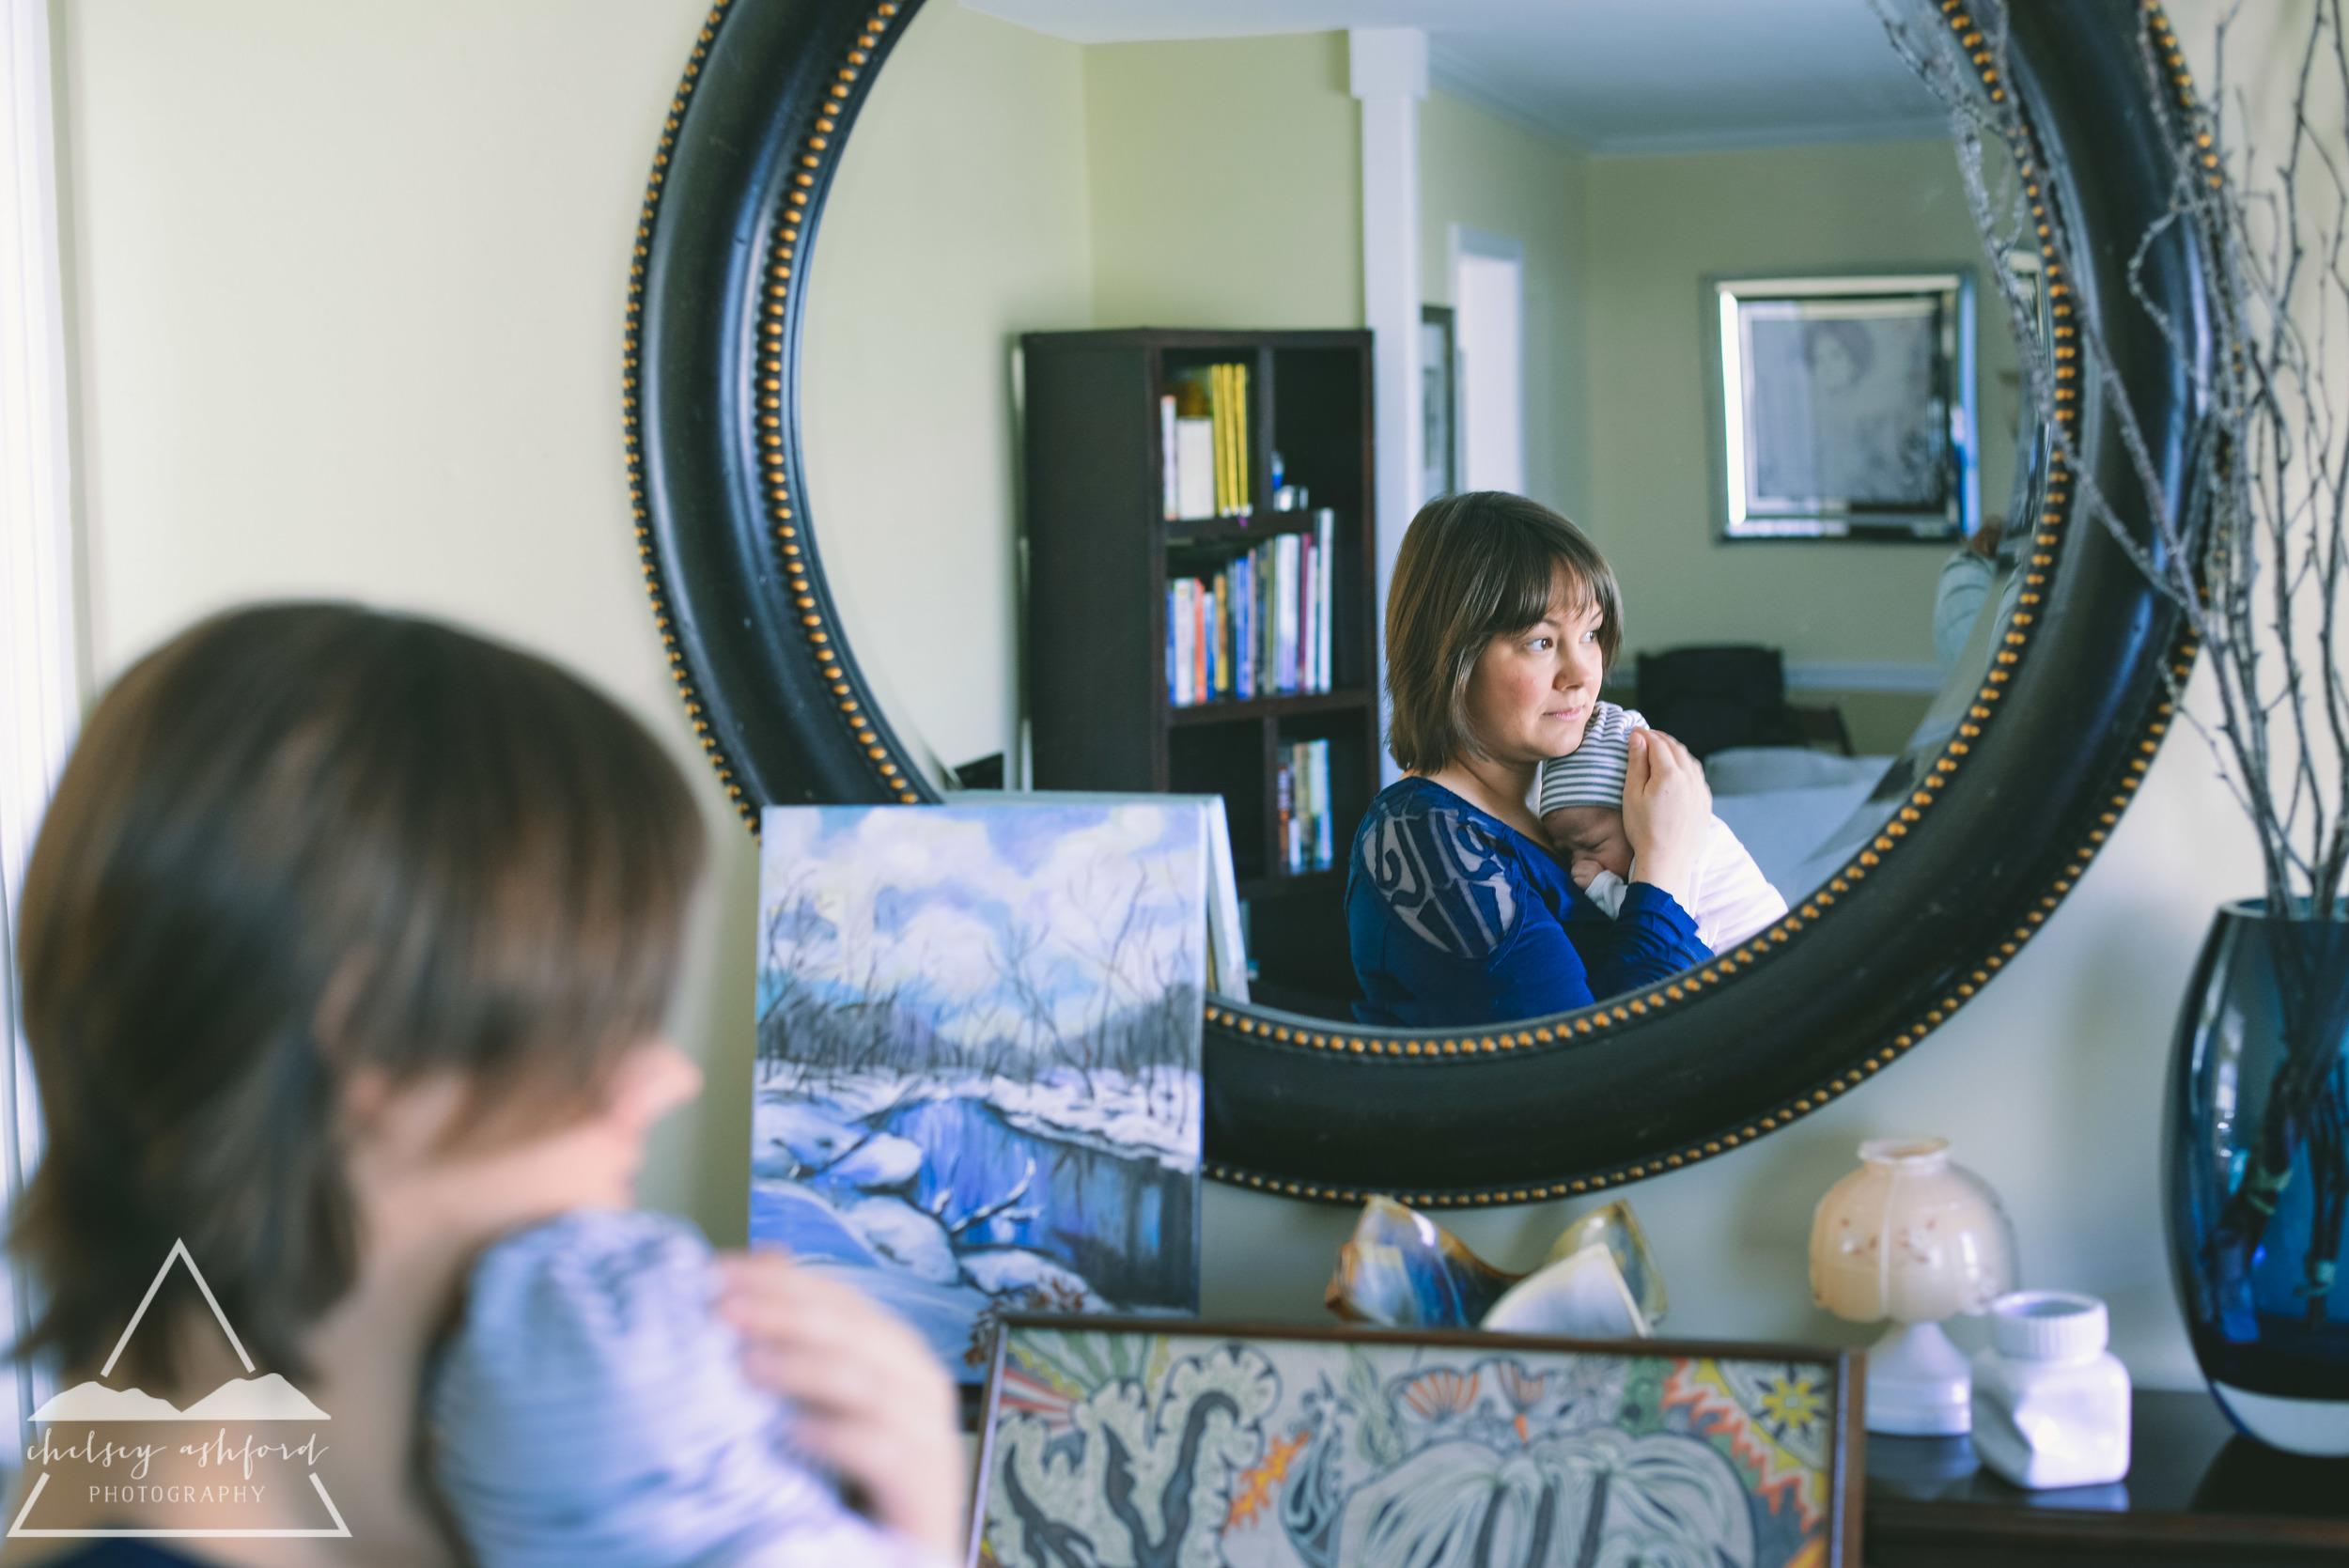 Lifestyle Newborn Session // Chelsey Ashford Photography 2015